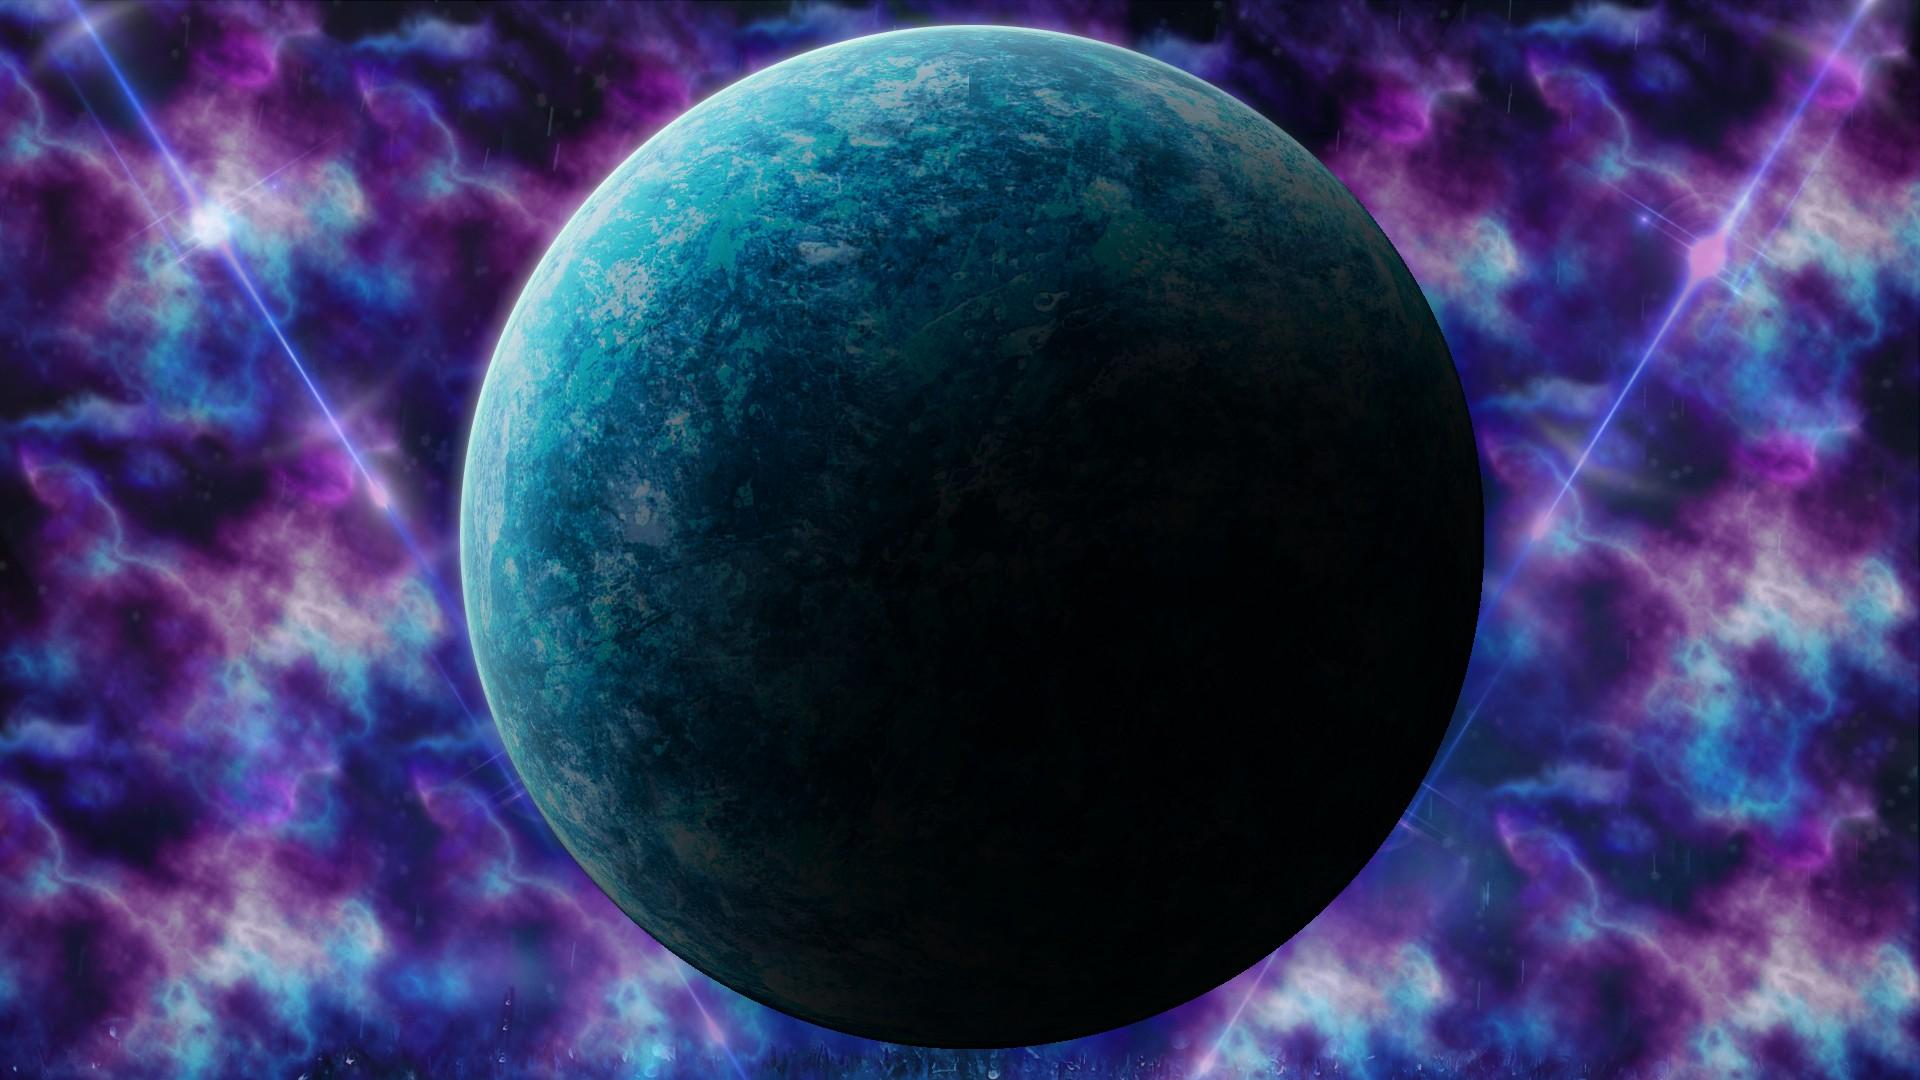 General 1920x1080 space nebula planet space art digital art